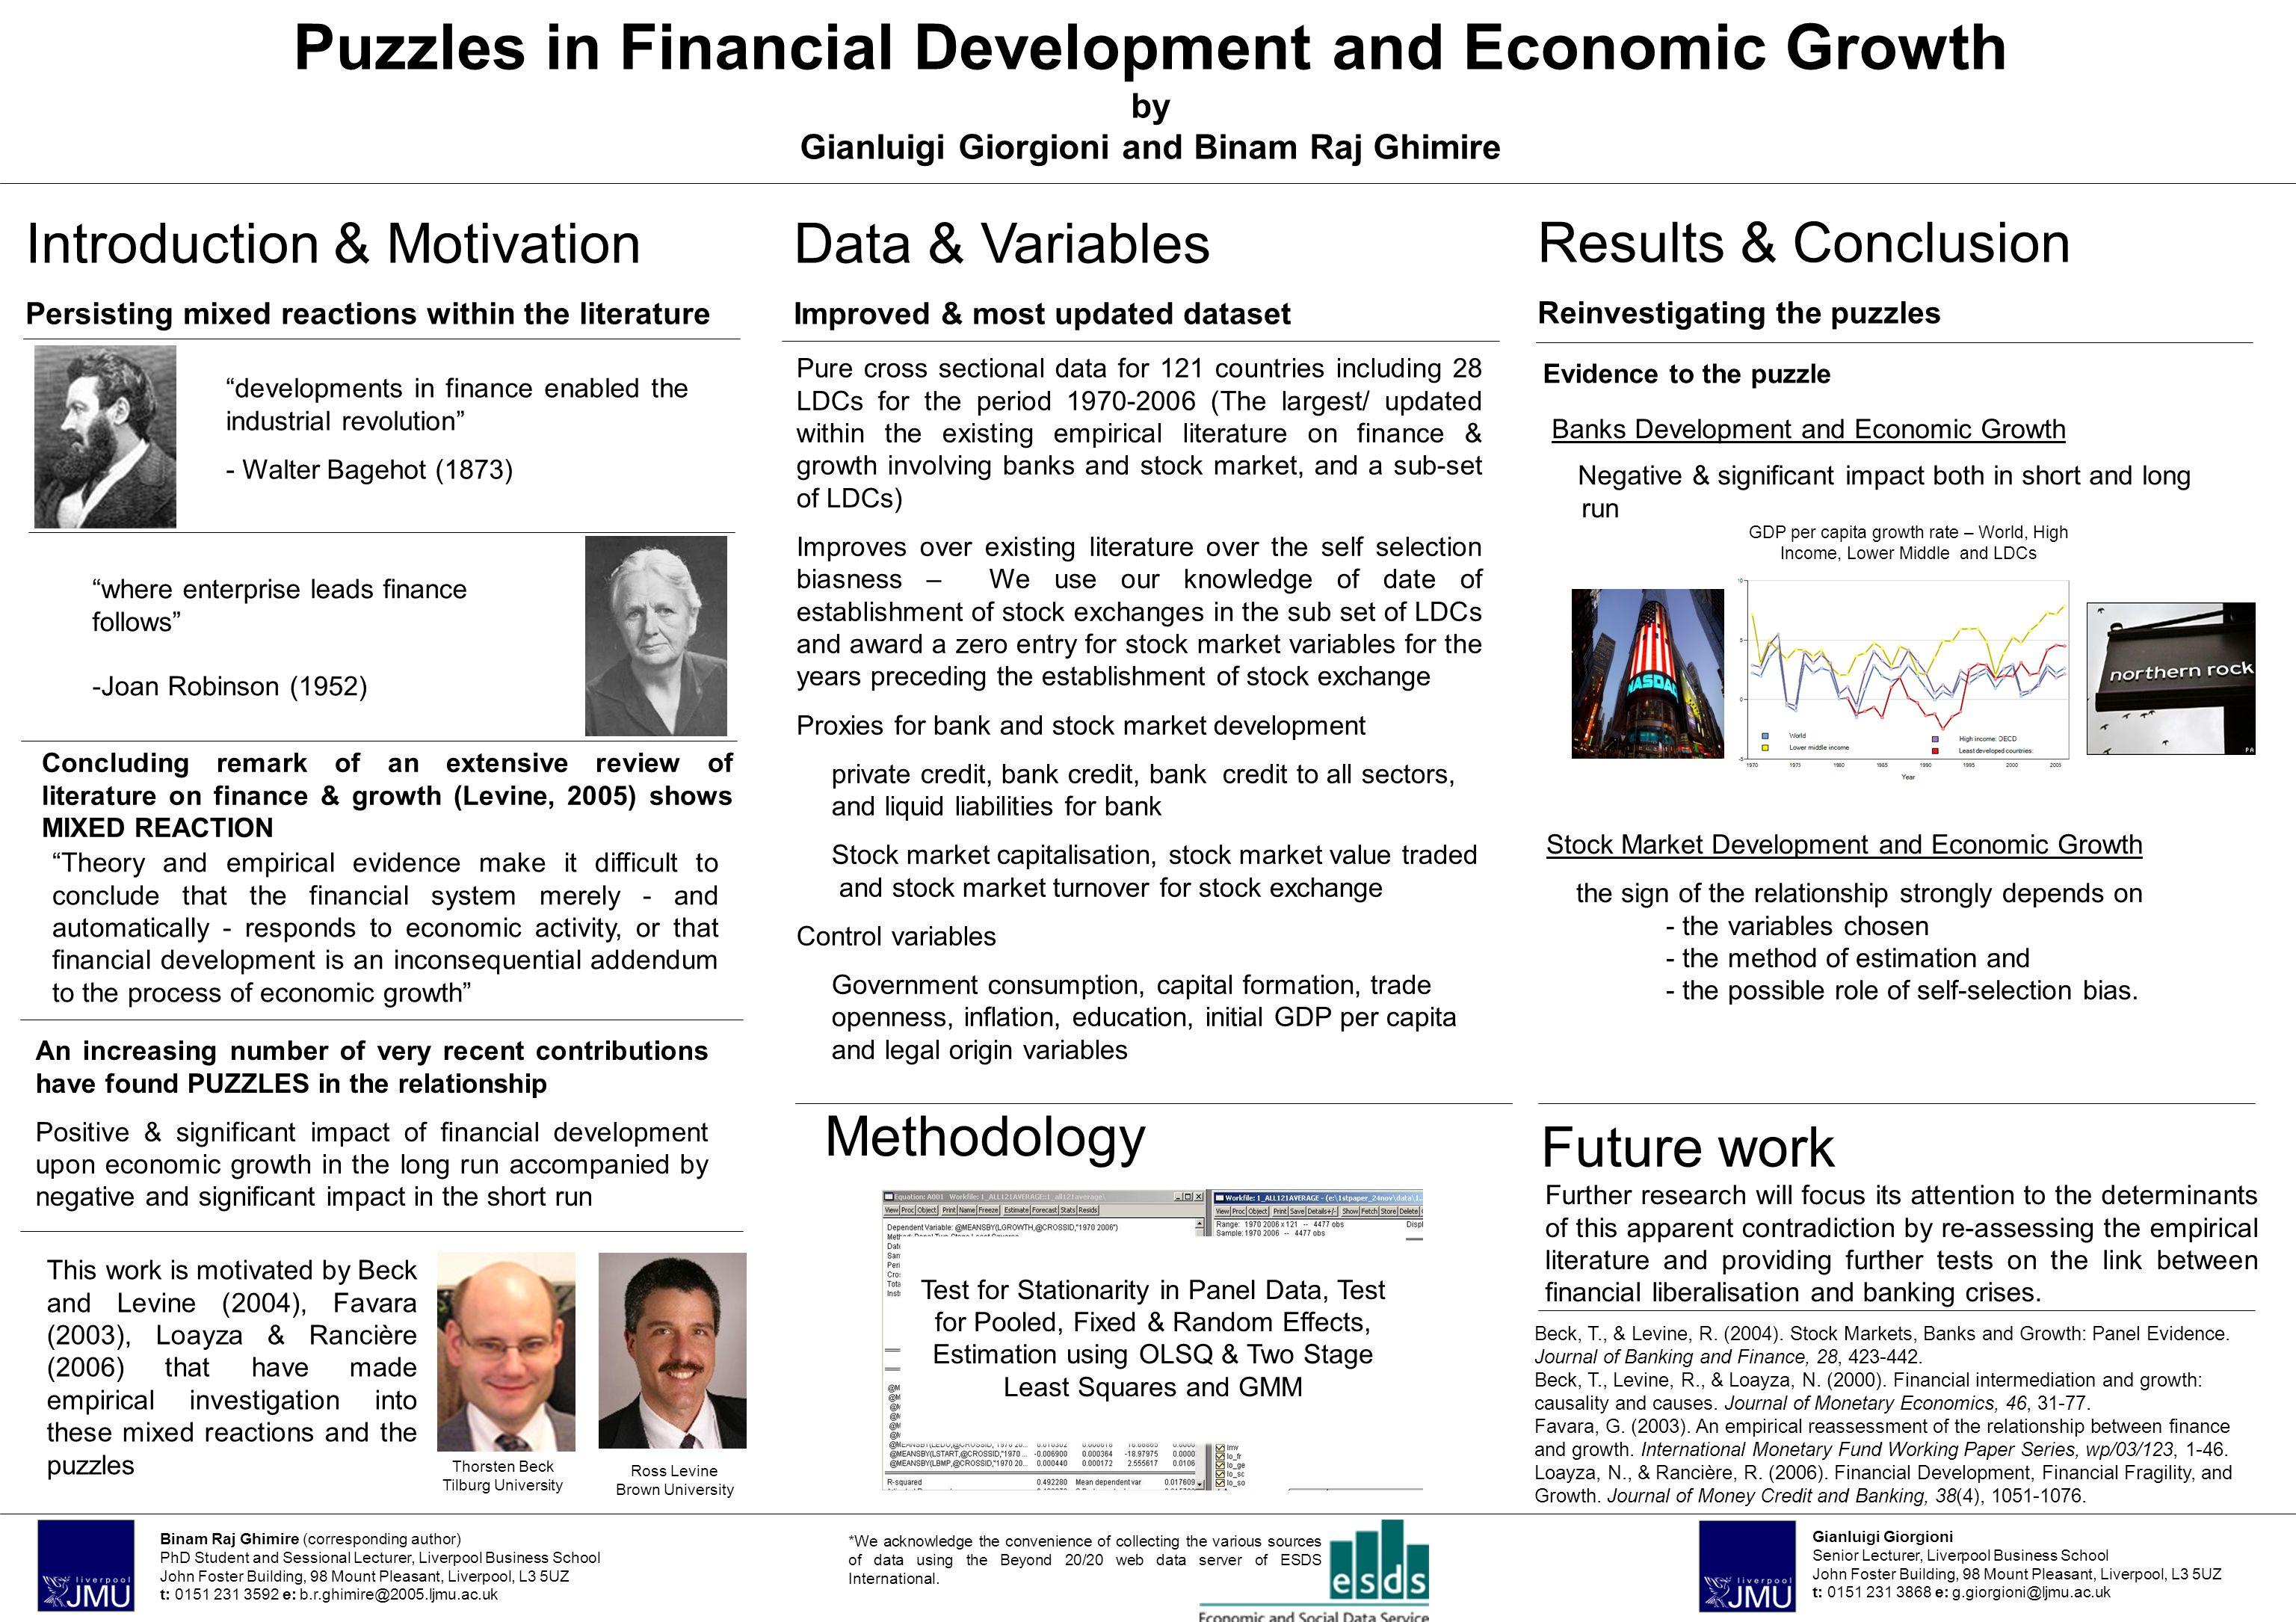 Puzzles in Financial Development and Economic Growth by Gianluigi Giorgioni and Binam Raj Ghimire Banks Development and Economic Growth Negative & sig